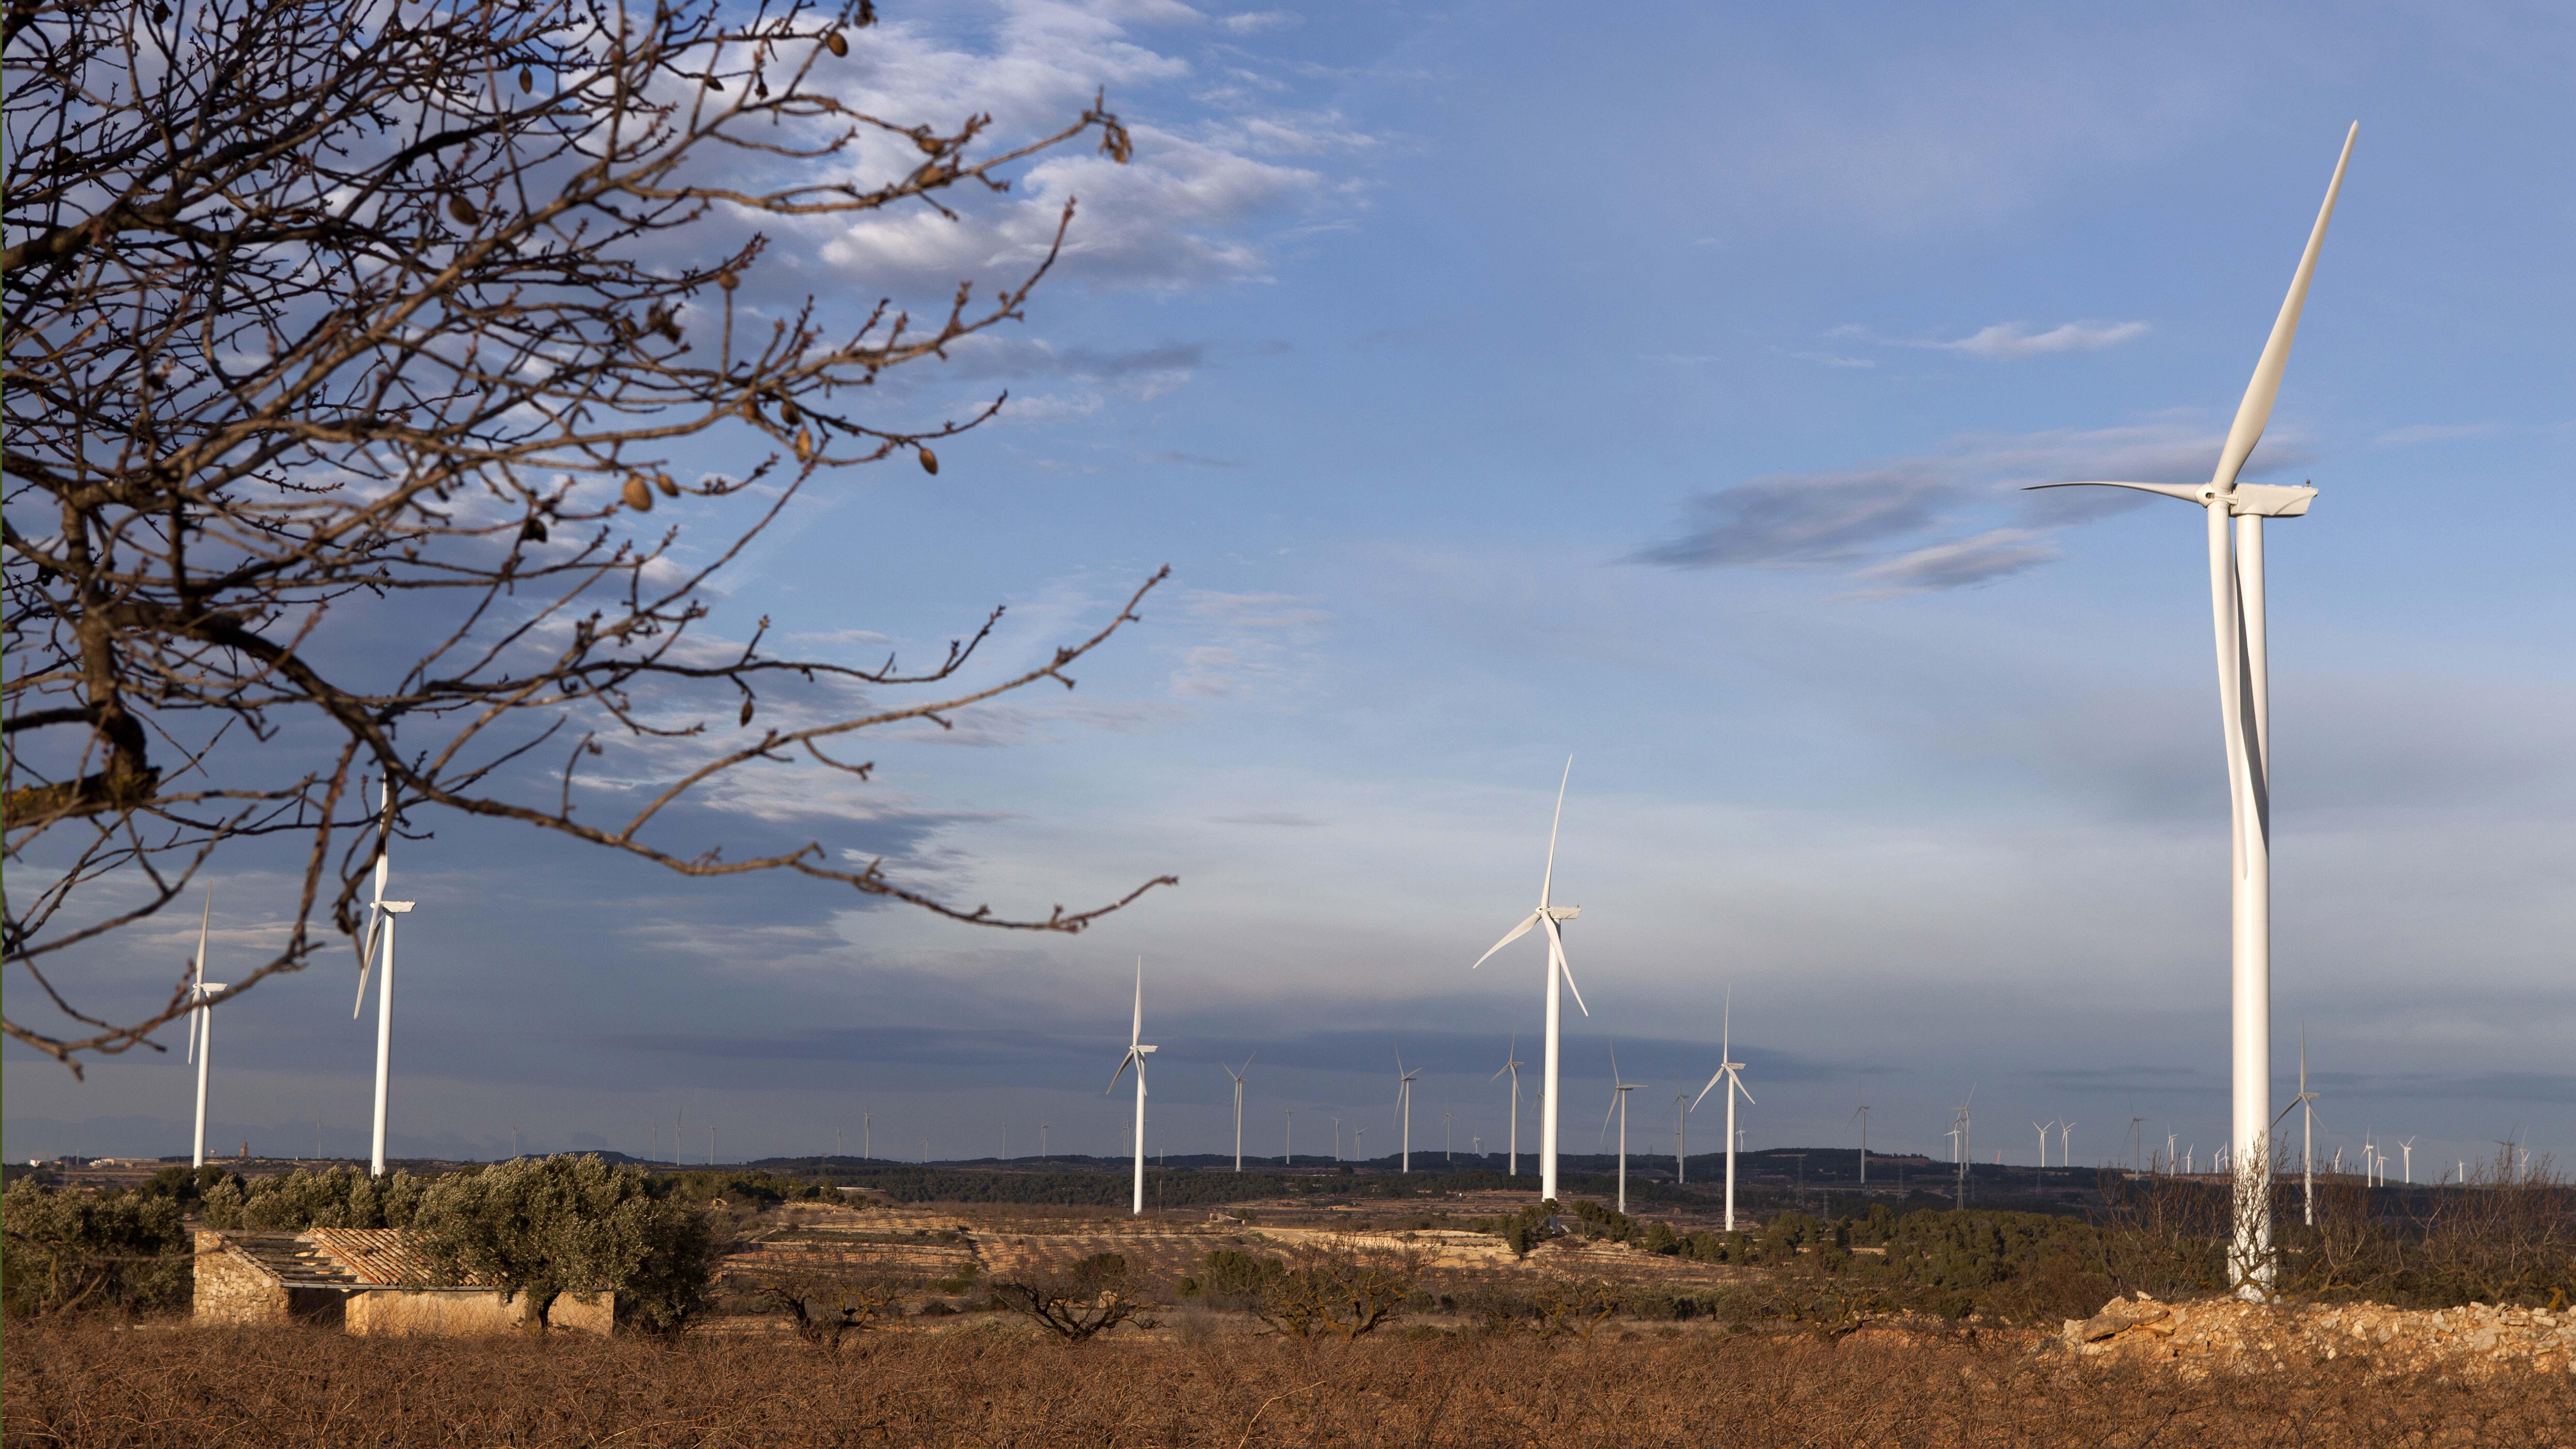 Windfarm Vilalba dels Arcs, Spain